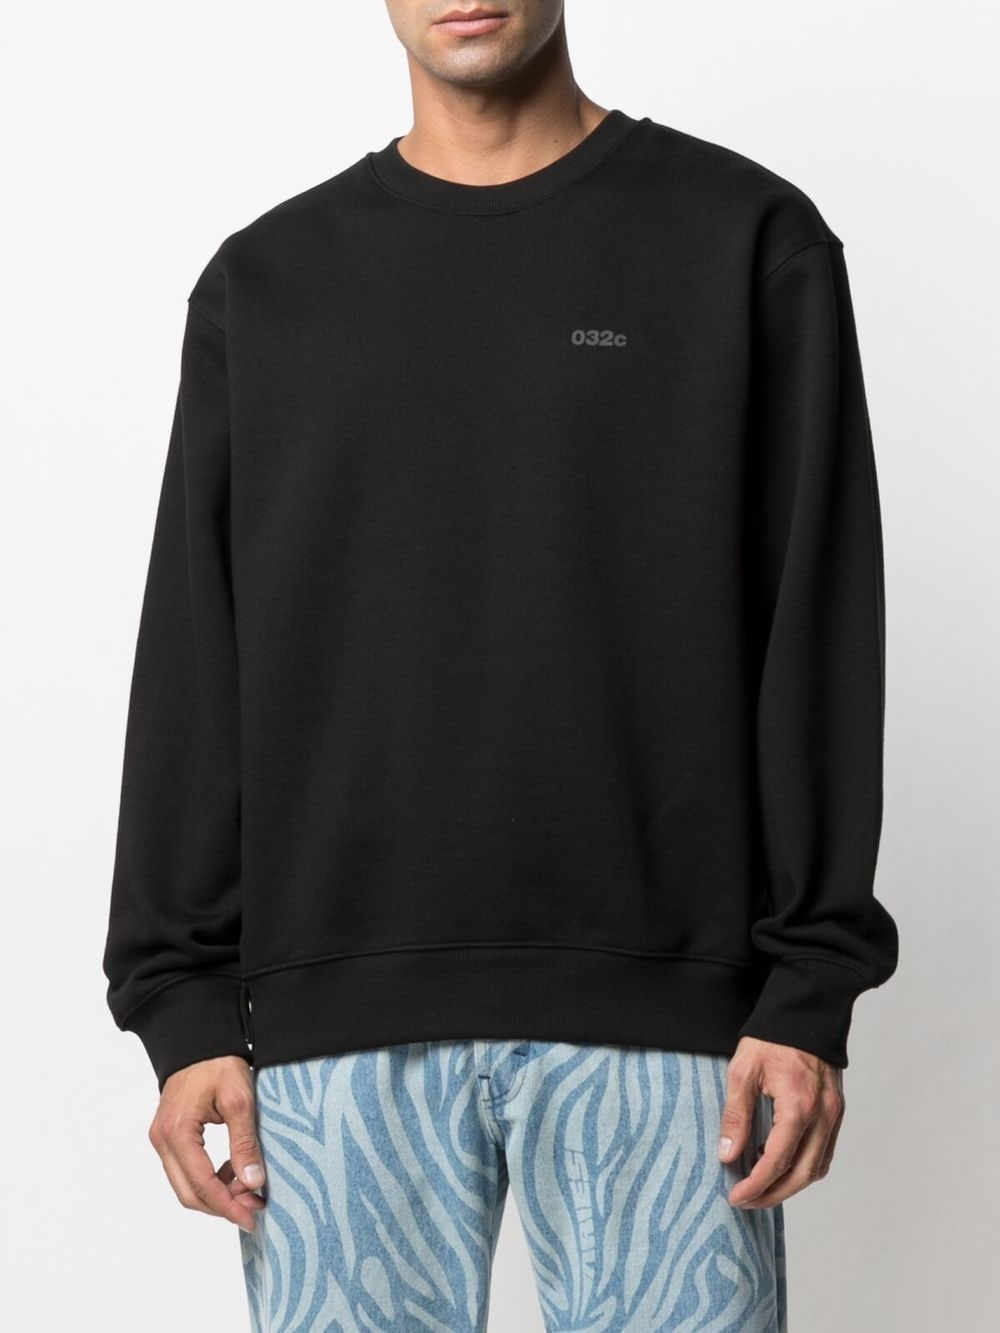 Heatwave crewneck sweatshirt man 032c   Sweatshirts   SS21-C-2060BLACK